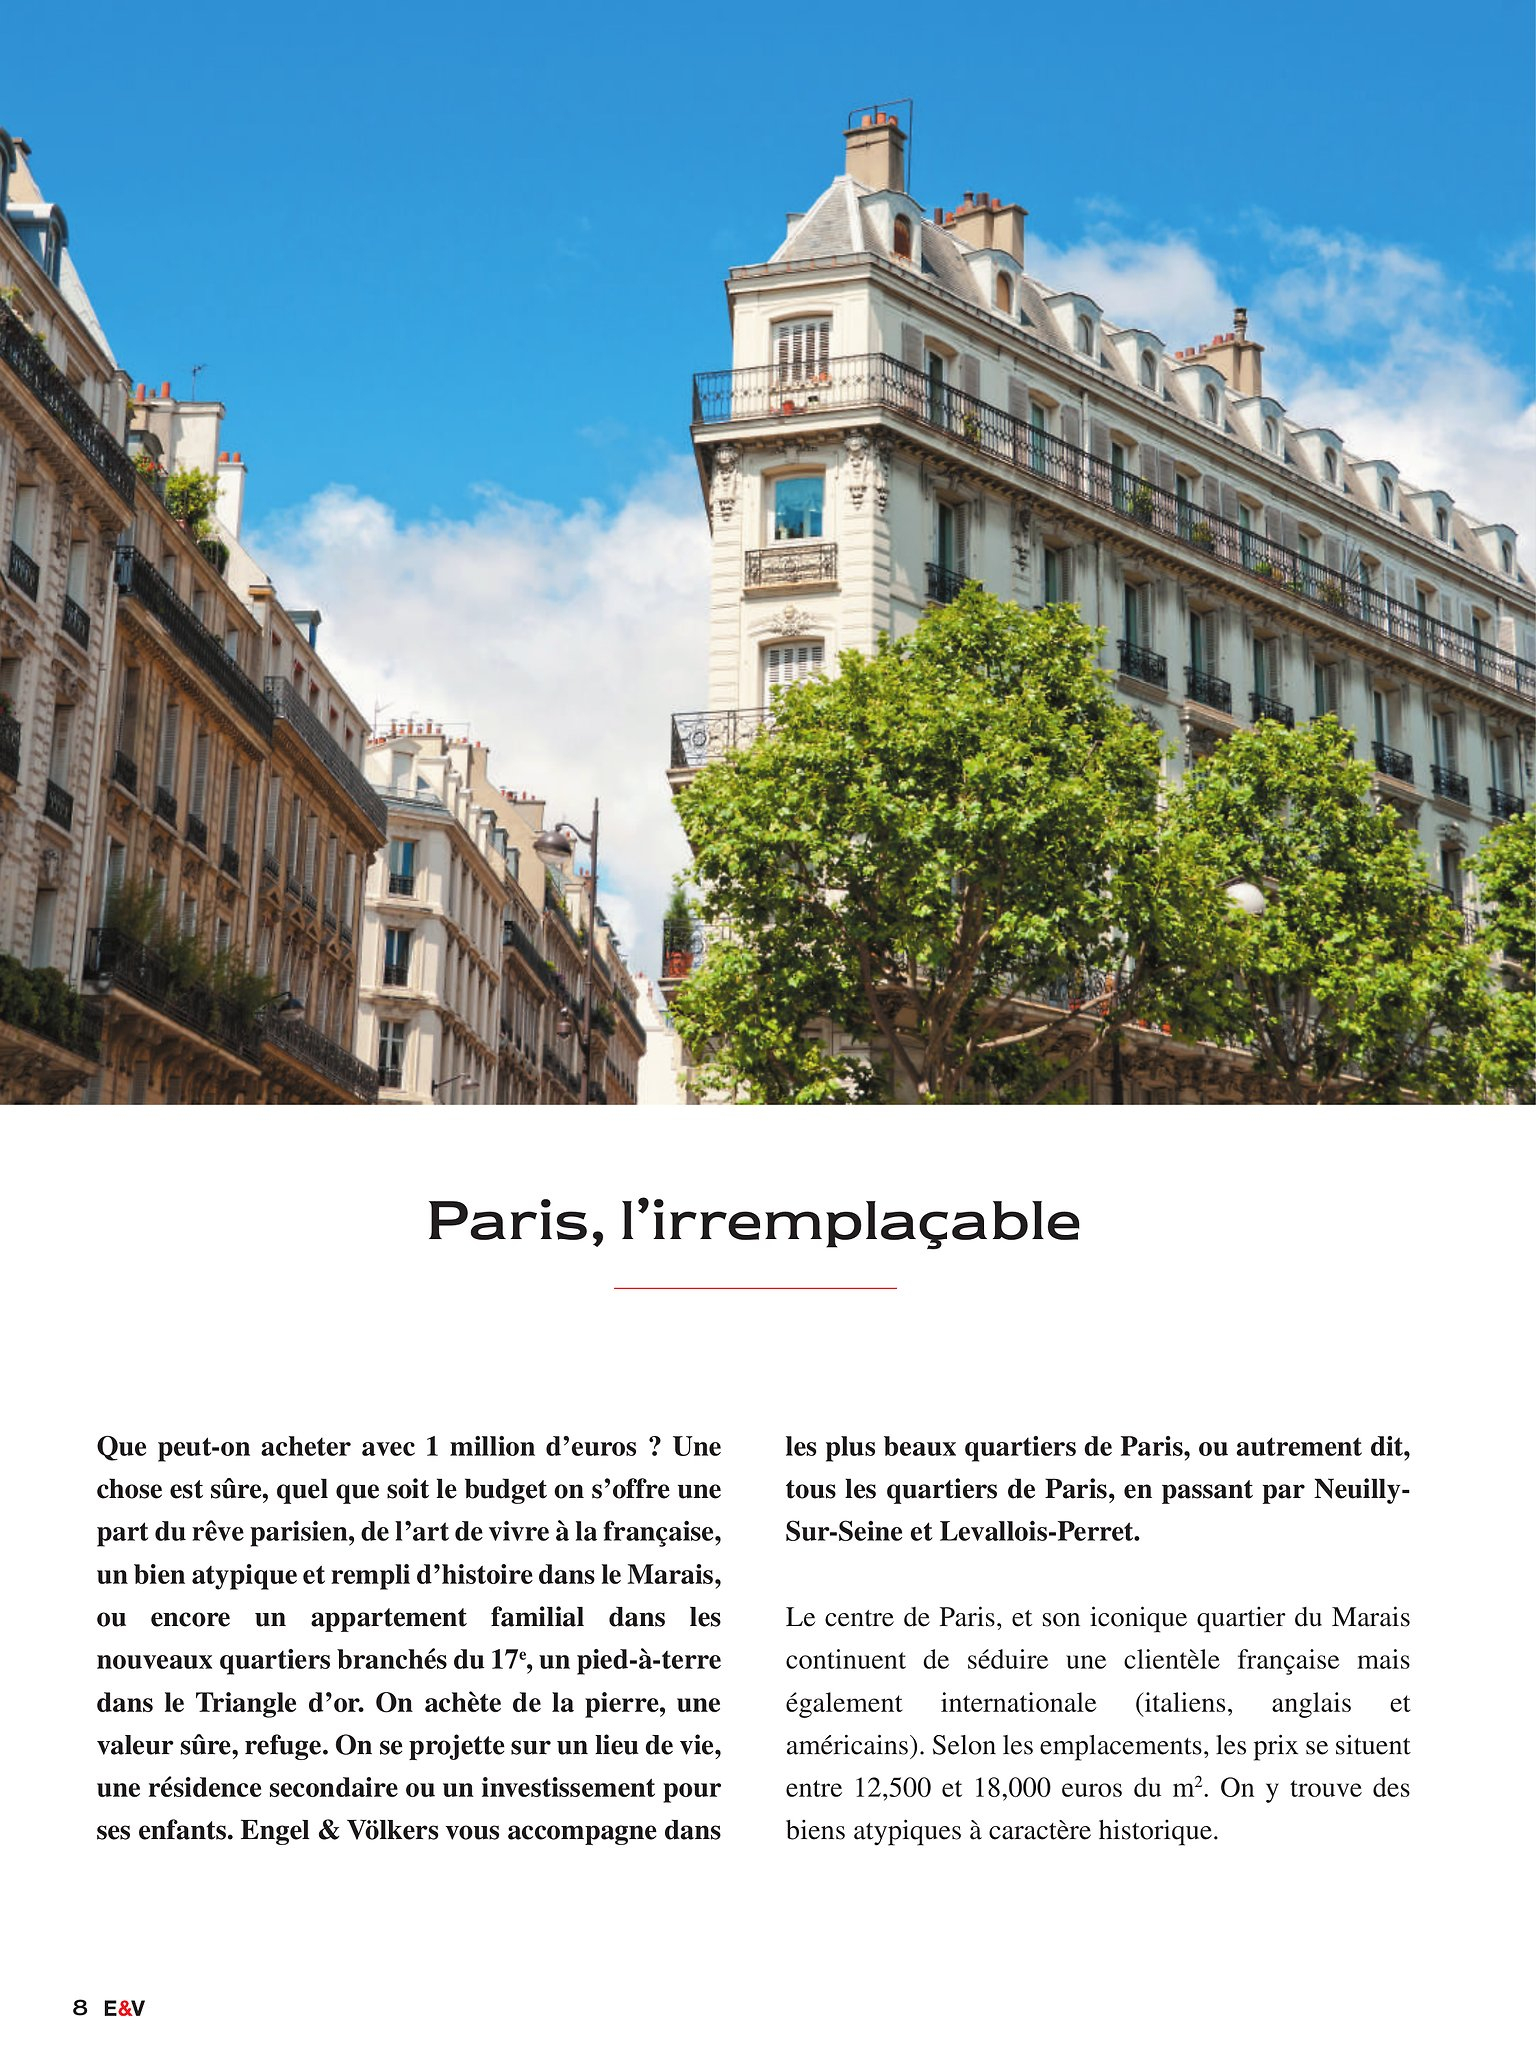 Privateresidencesparisplan Engel & Volkers - Flipbook - Page 8 concernant Grimper En Anglais